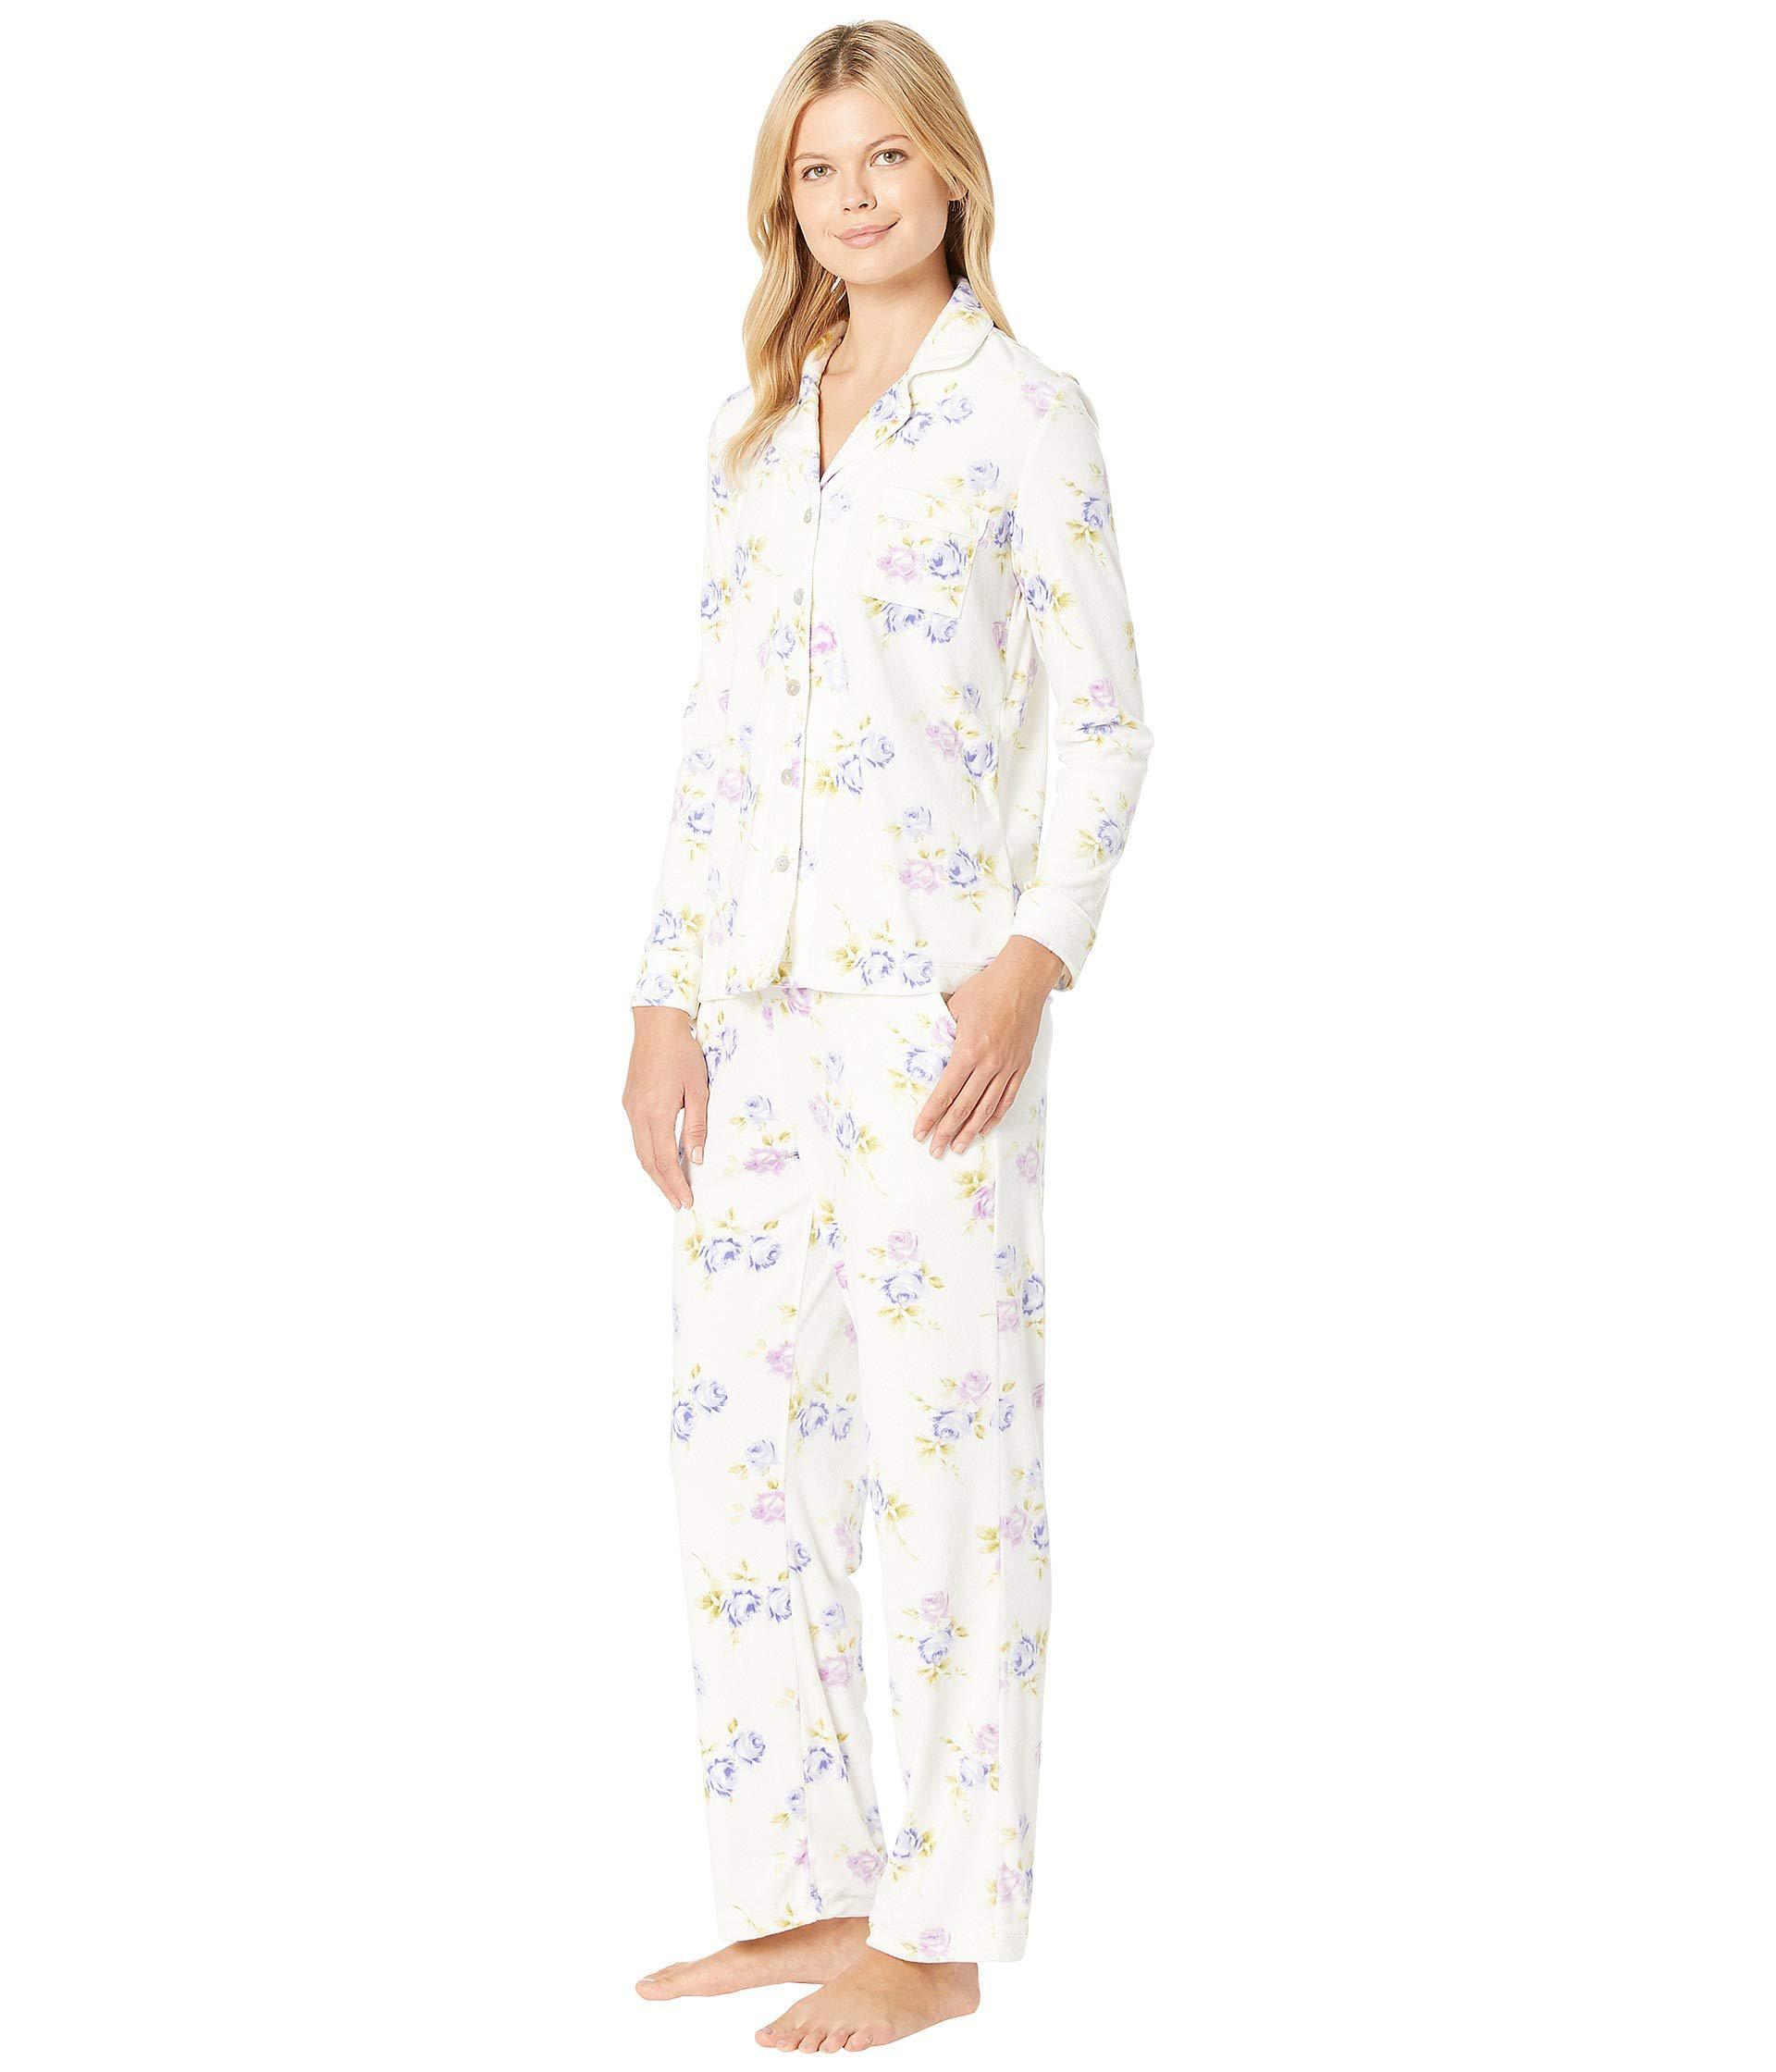 Lyst Carole Hochman Luxe Cozy Fleece Pajama Set Sapphire Dot